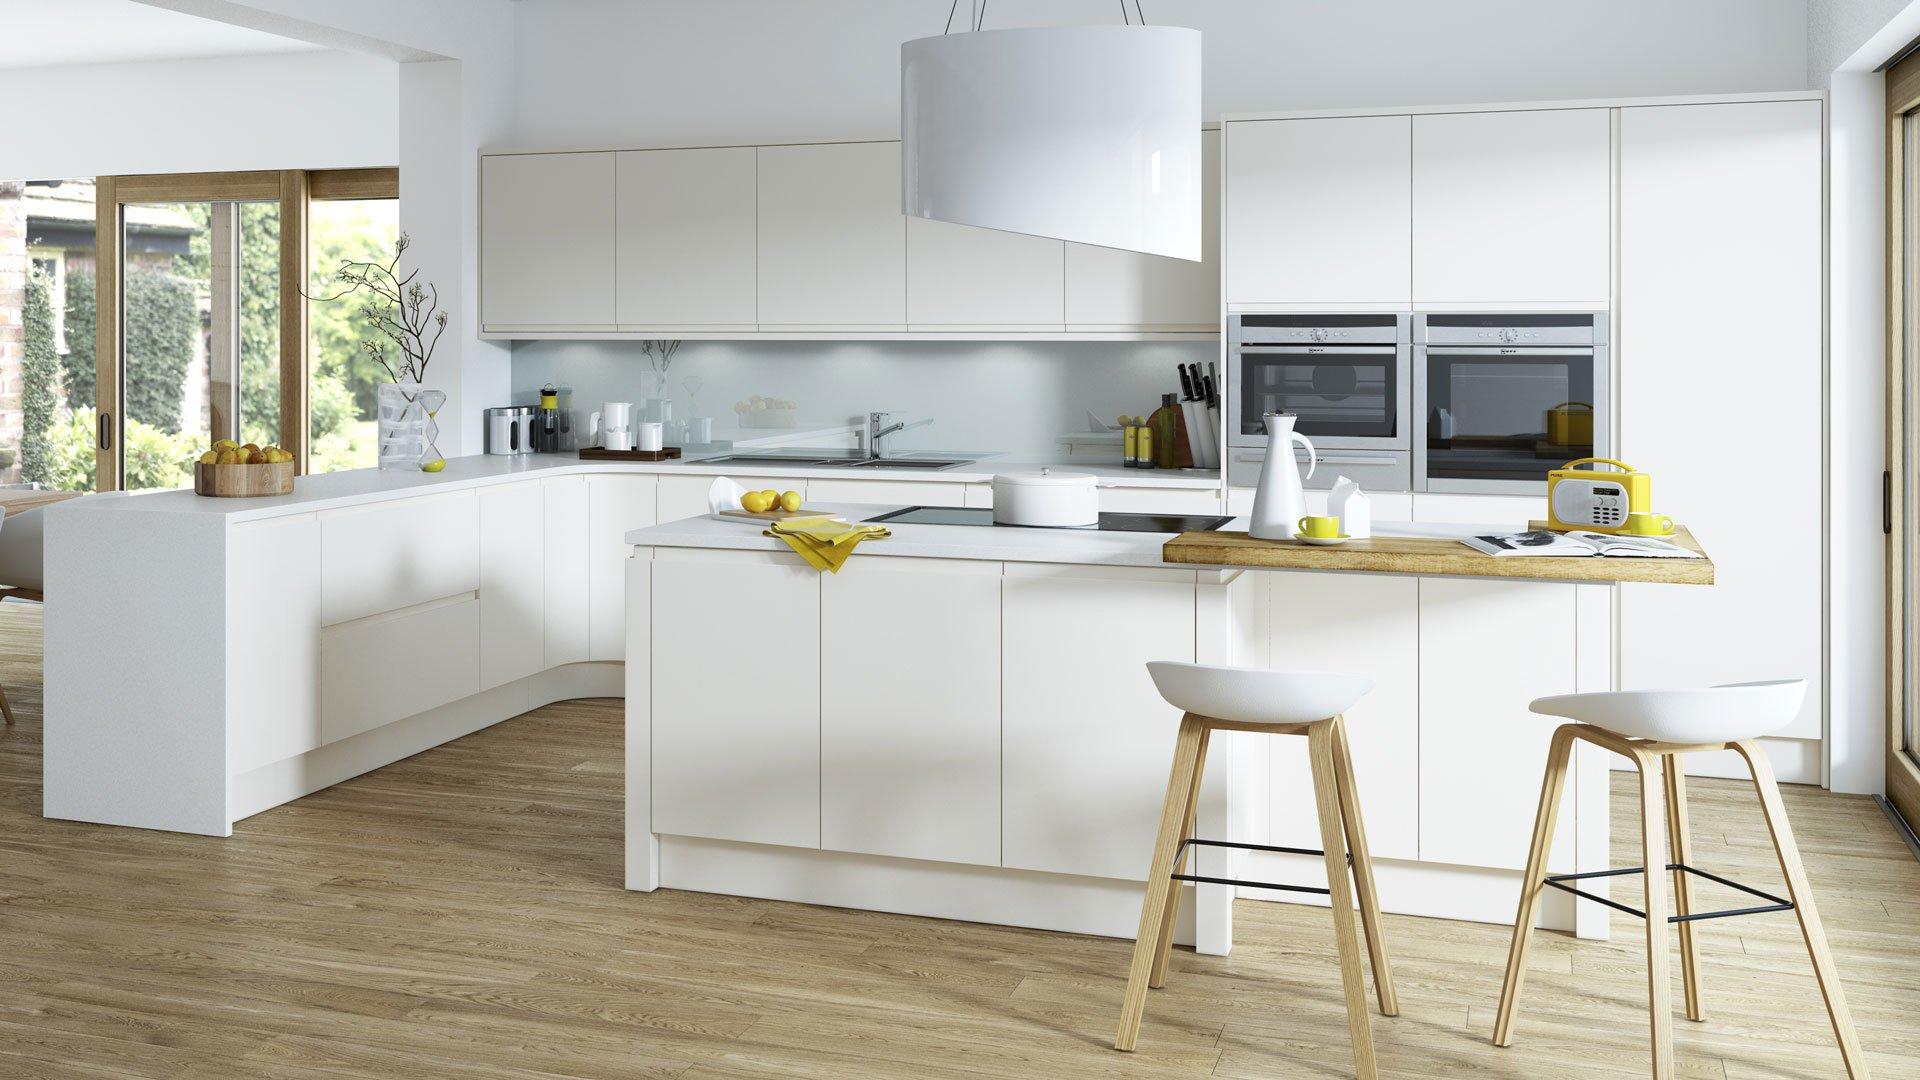 Multiwood Aconbury Matt - Porcelain Kitchen